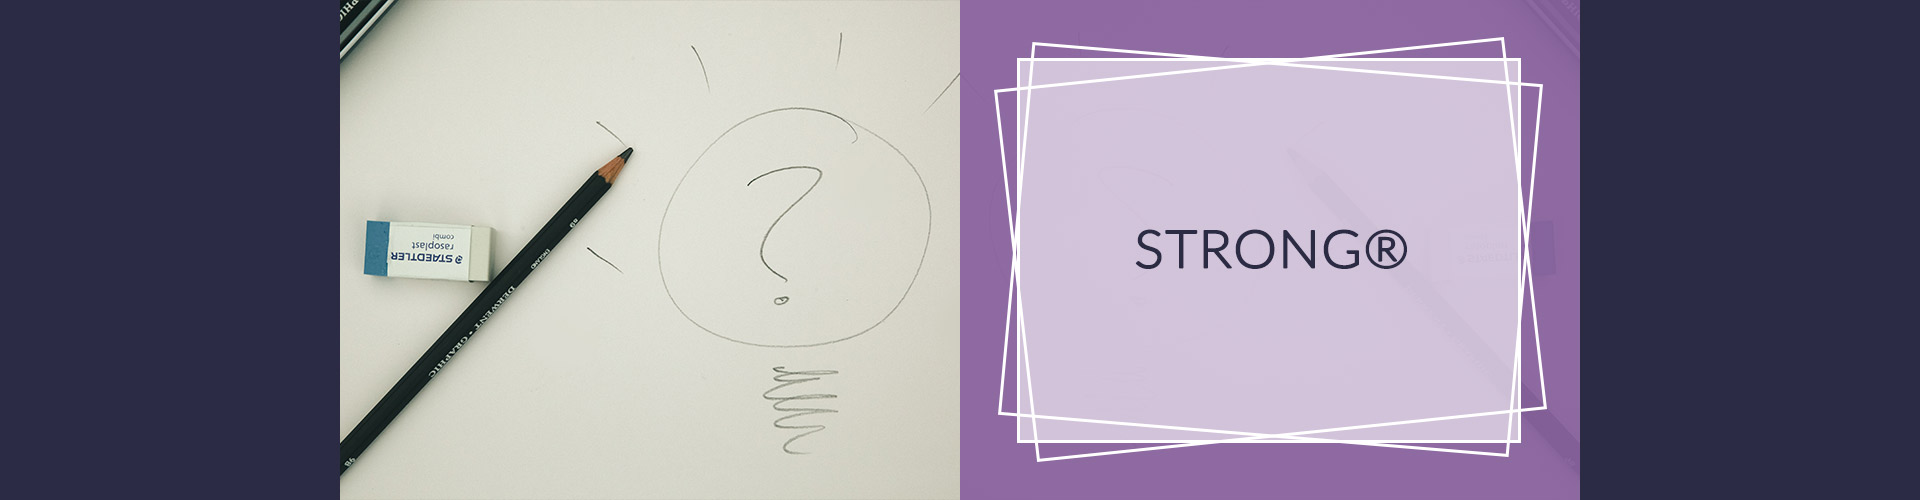 QUESTIONNAIRE-STRONG - Coaching International